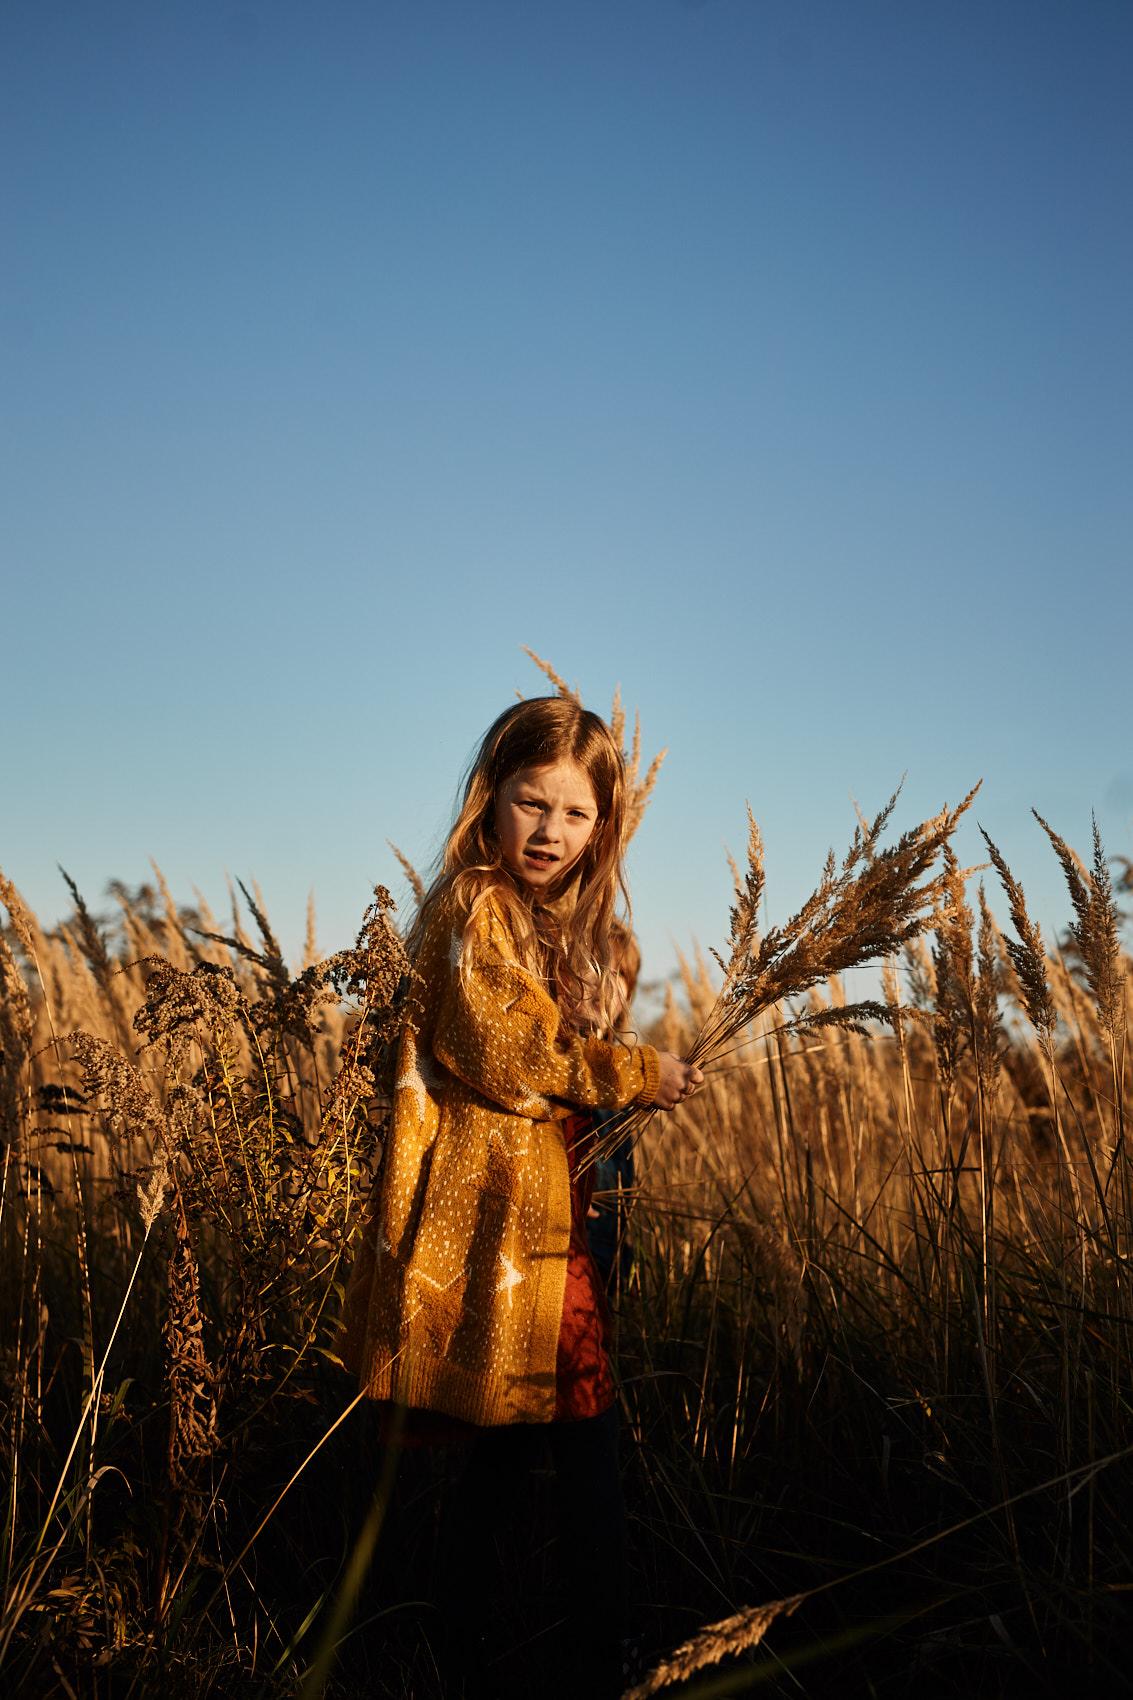 fotograf warszawa plener sesja dziecieca